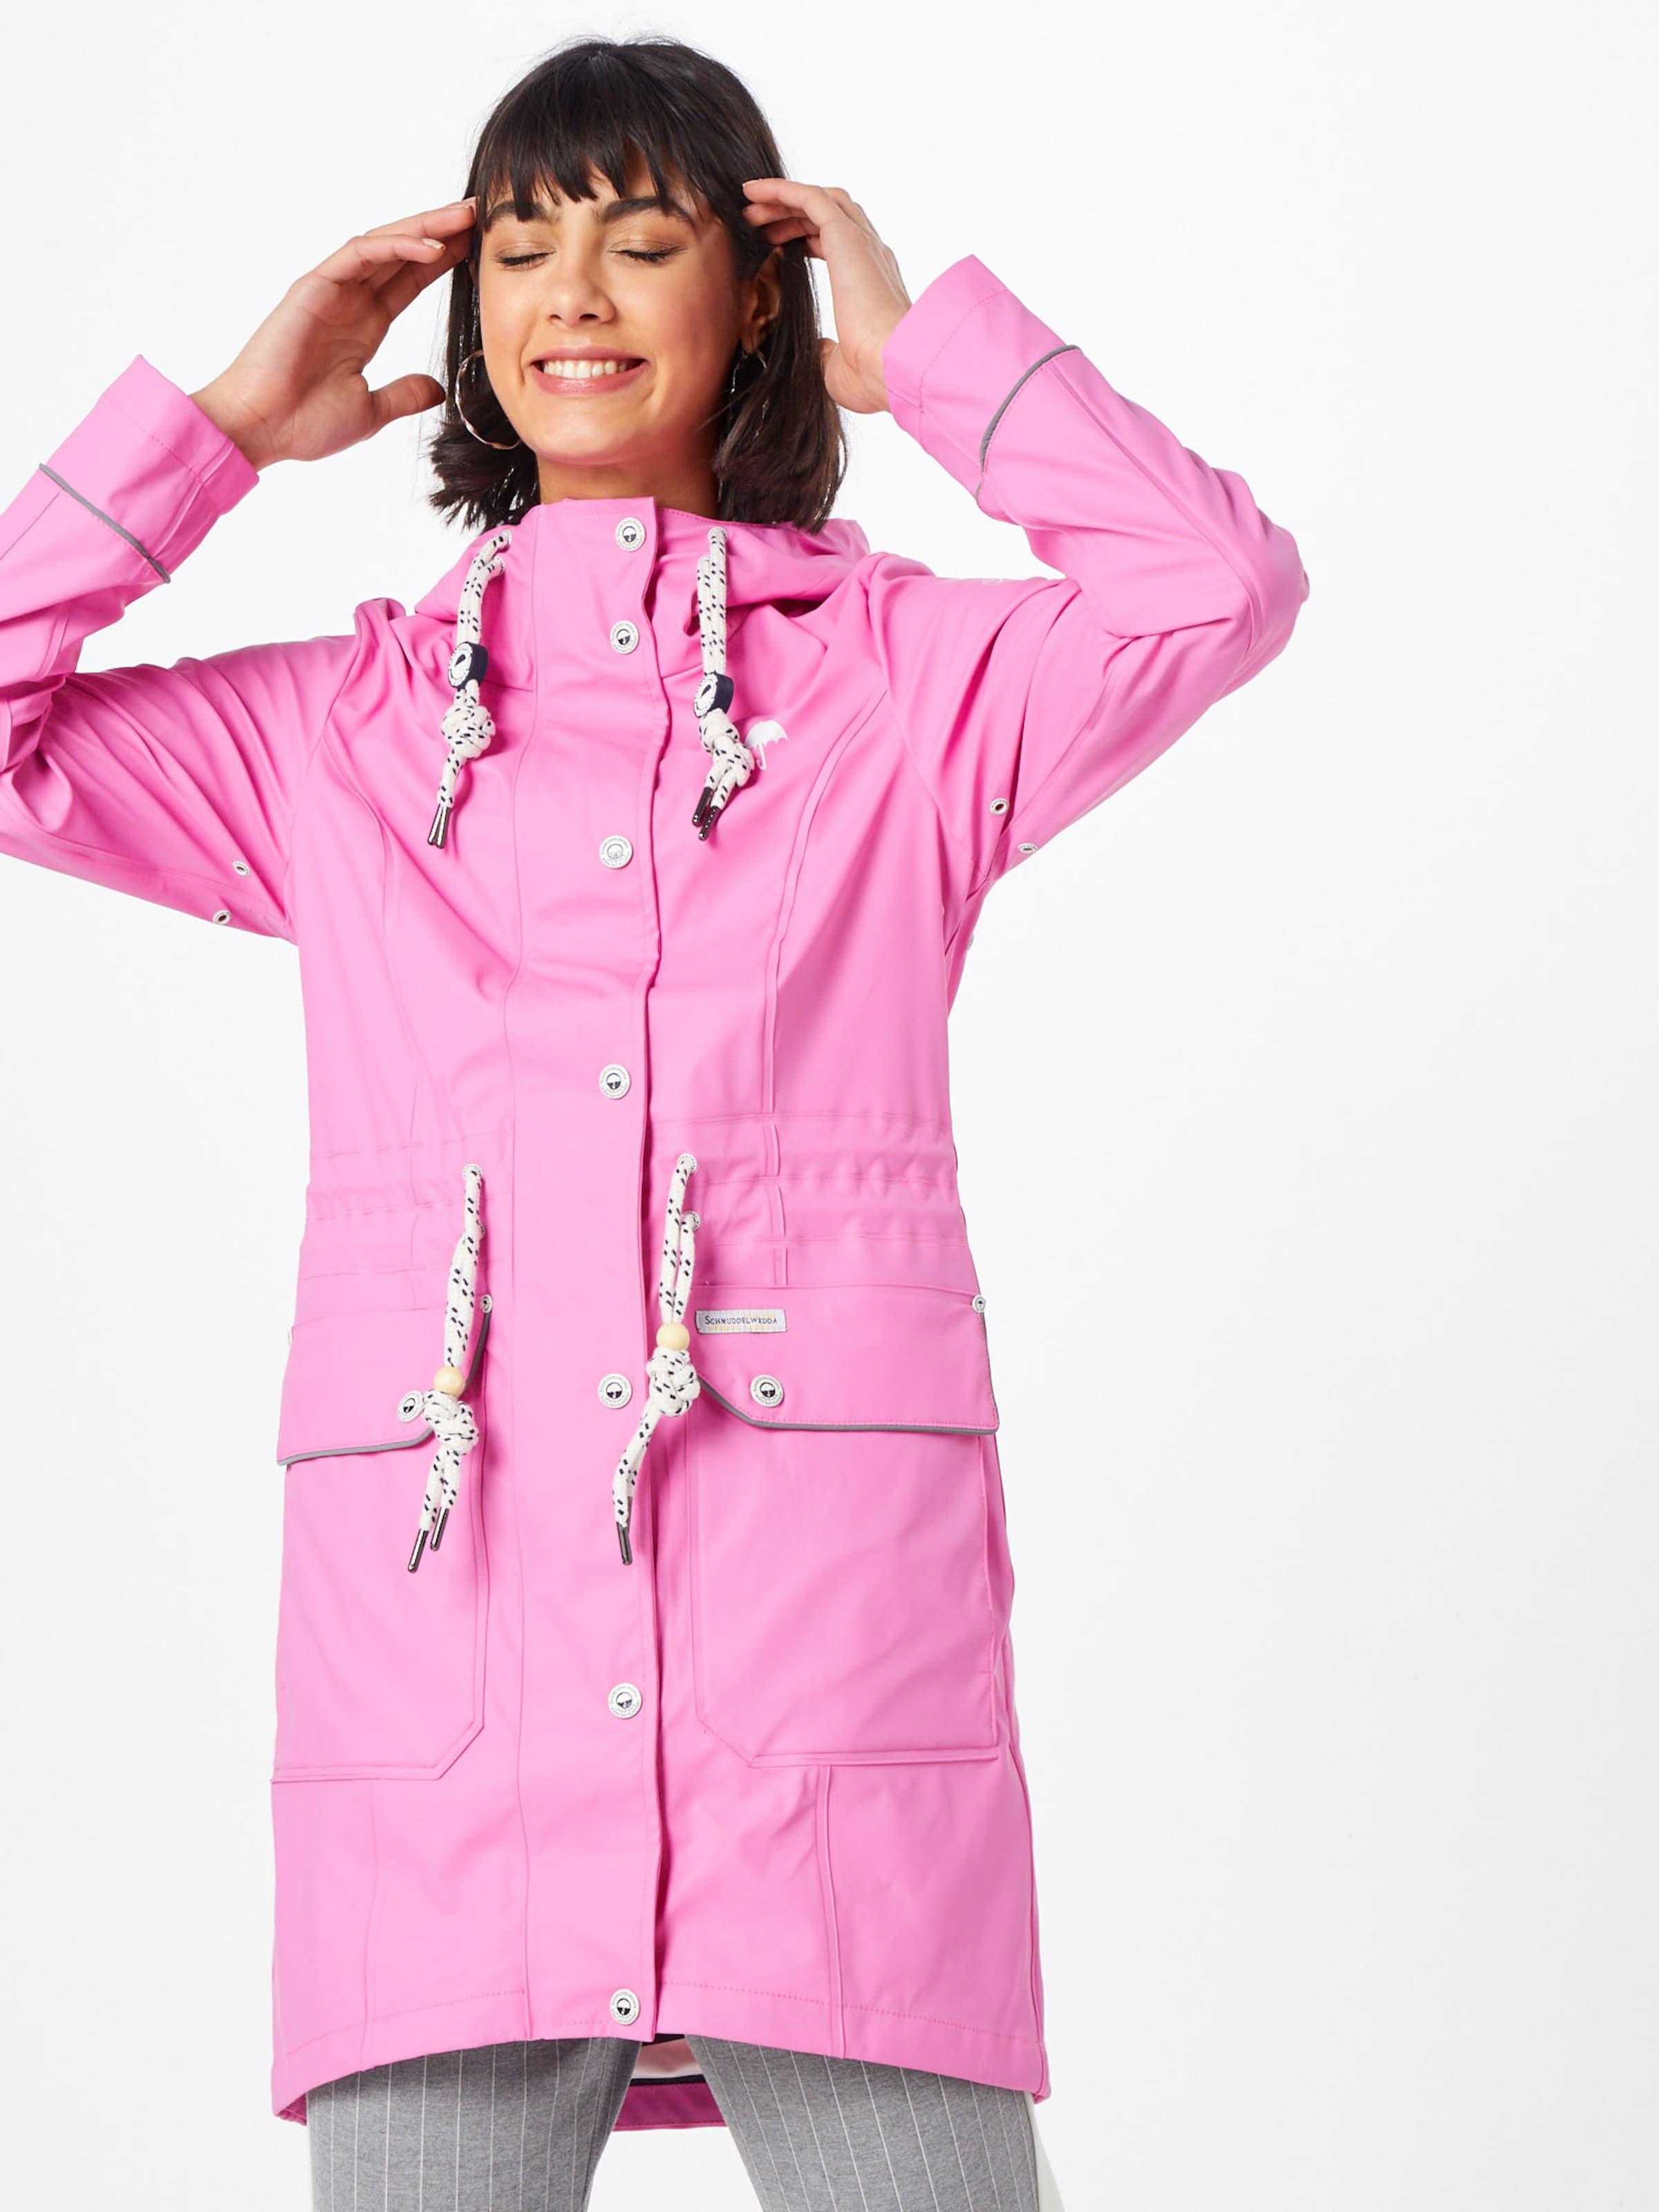 Regenjacke In Pink Schmuddelwedda Schmuddelwedda Pink Schmuddelwedda In Regenjacke Regenjacke In nPwkX80O